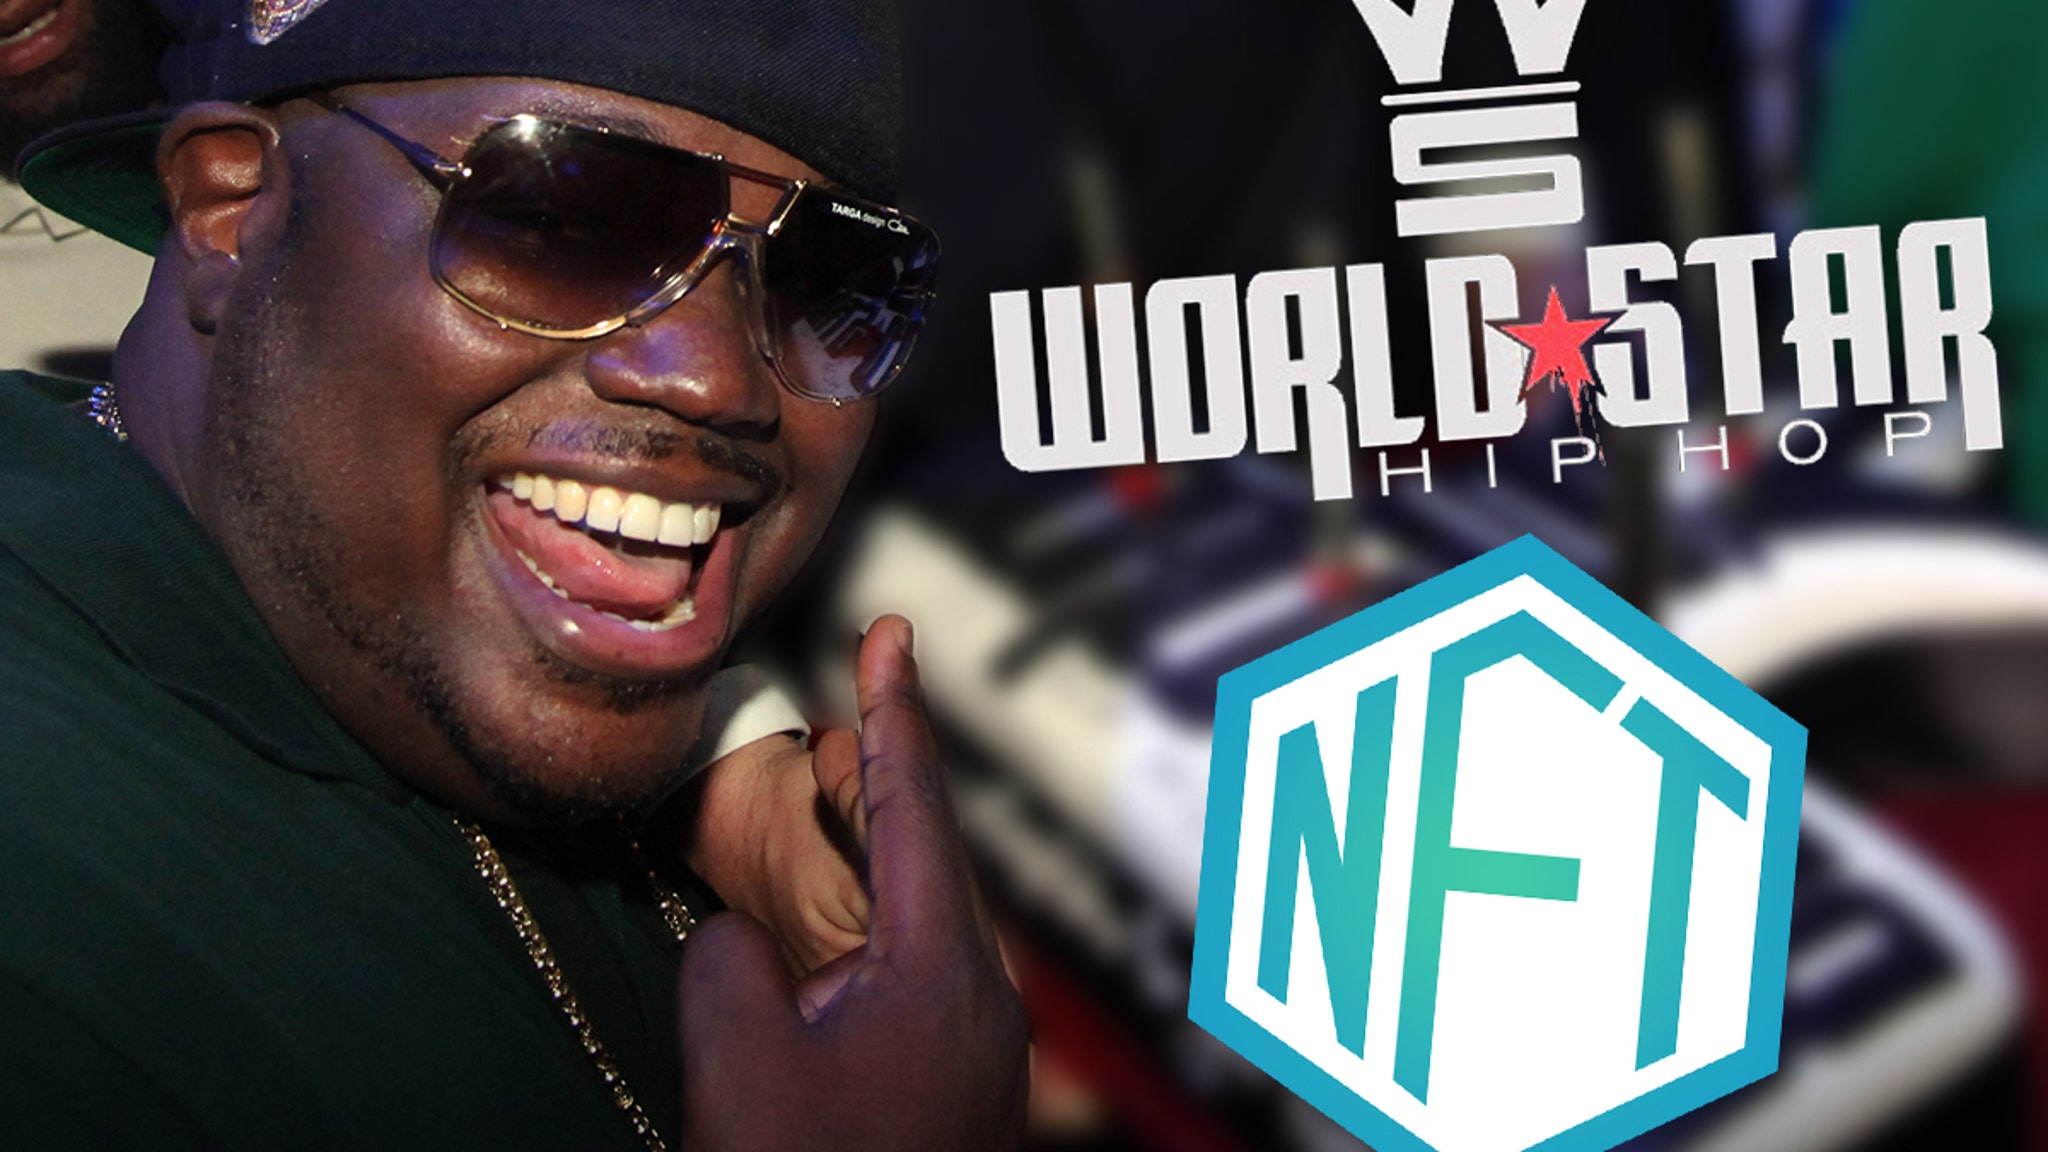 WorldStar Hip Hop Chain Hits NFT Auction Block, Raking More Than 6-Figures